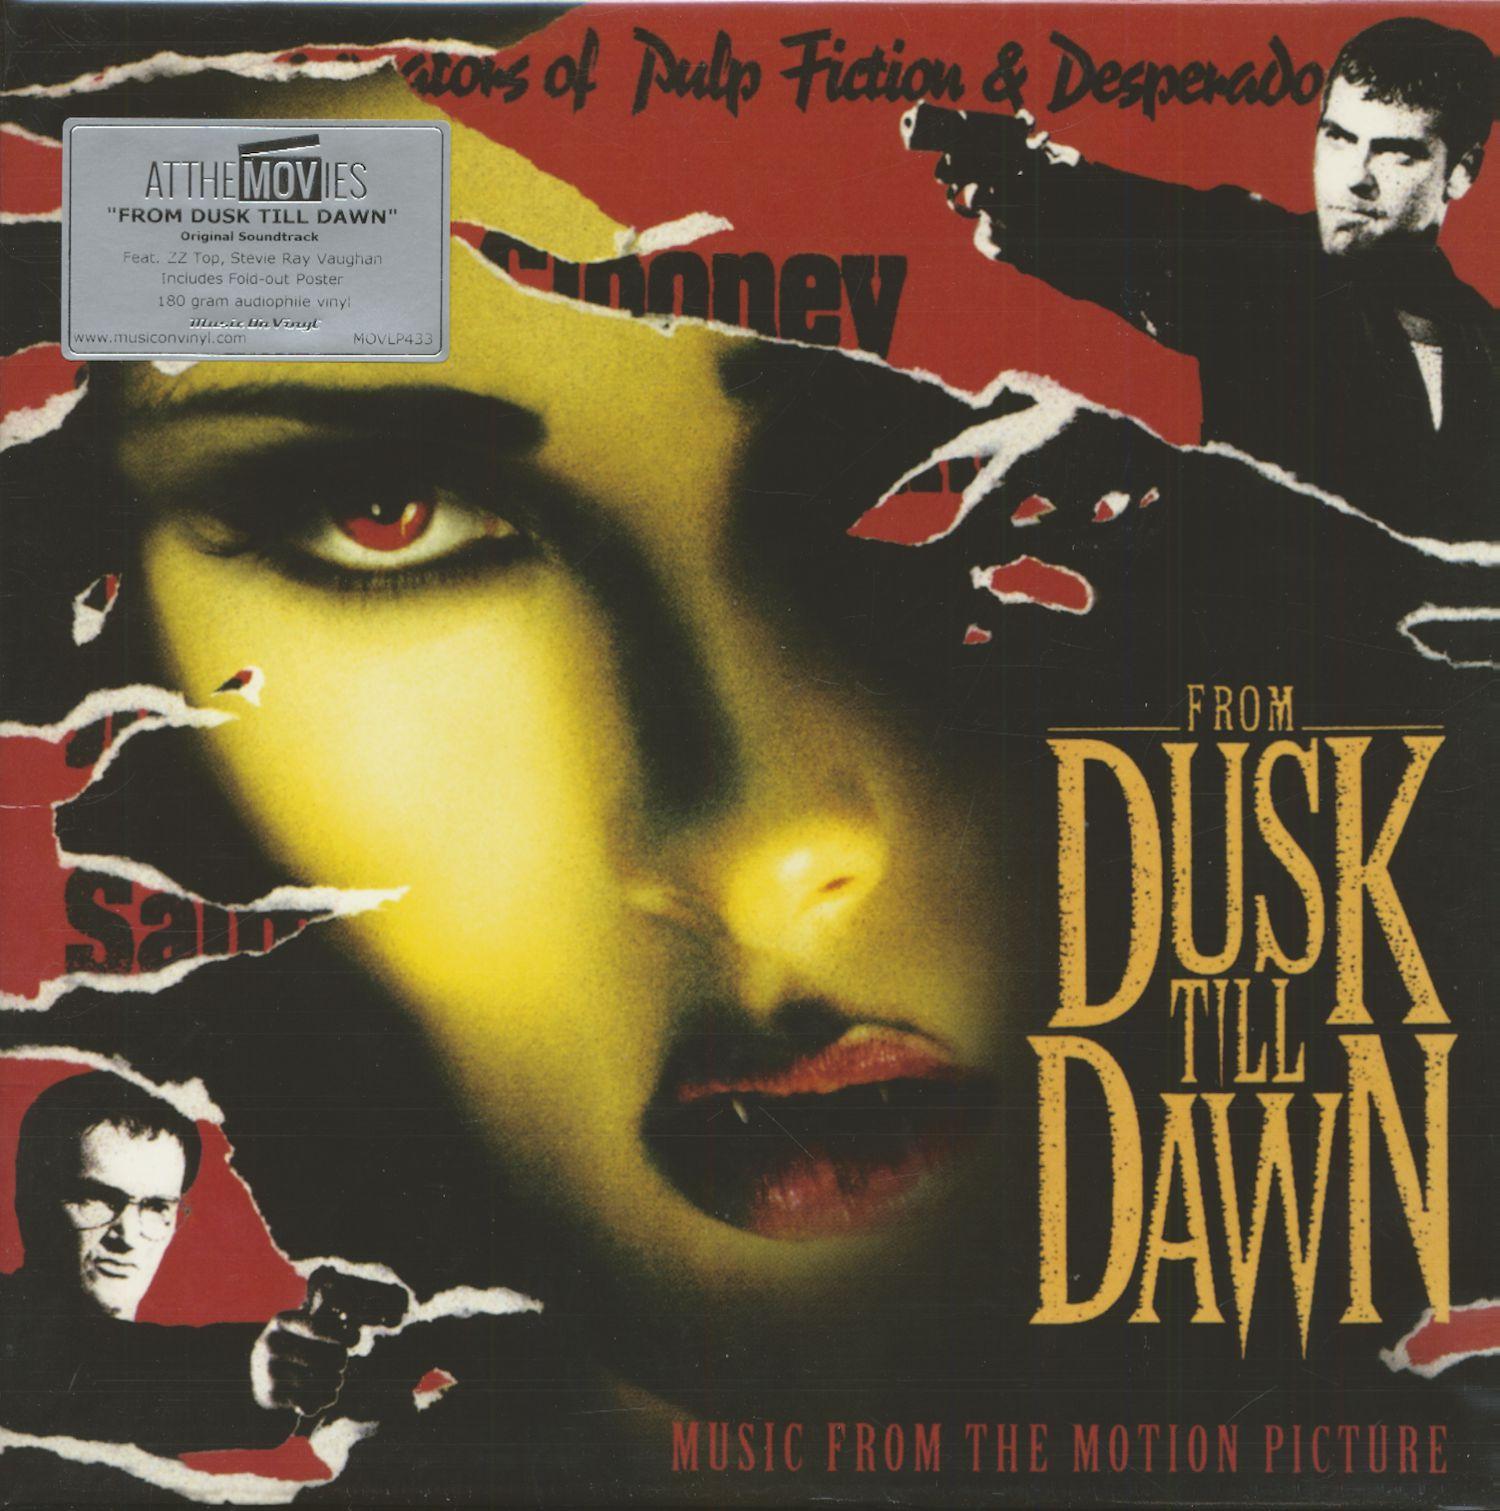 from dusk till dawn soundtrack